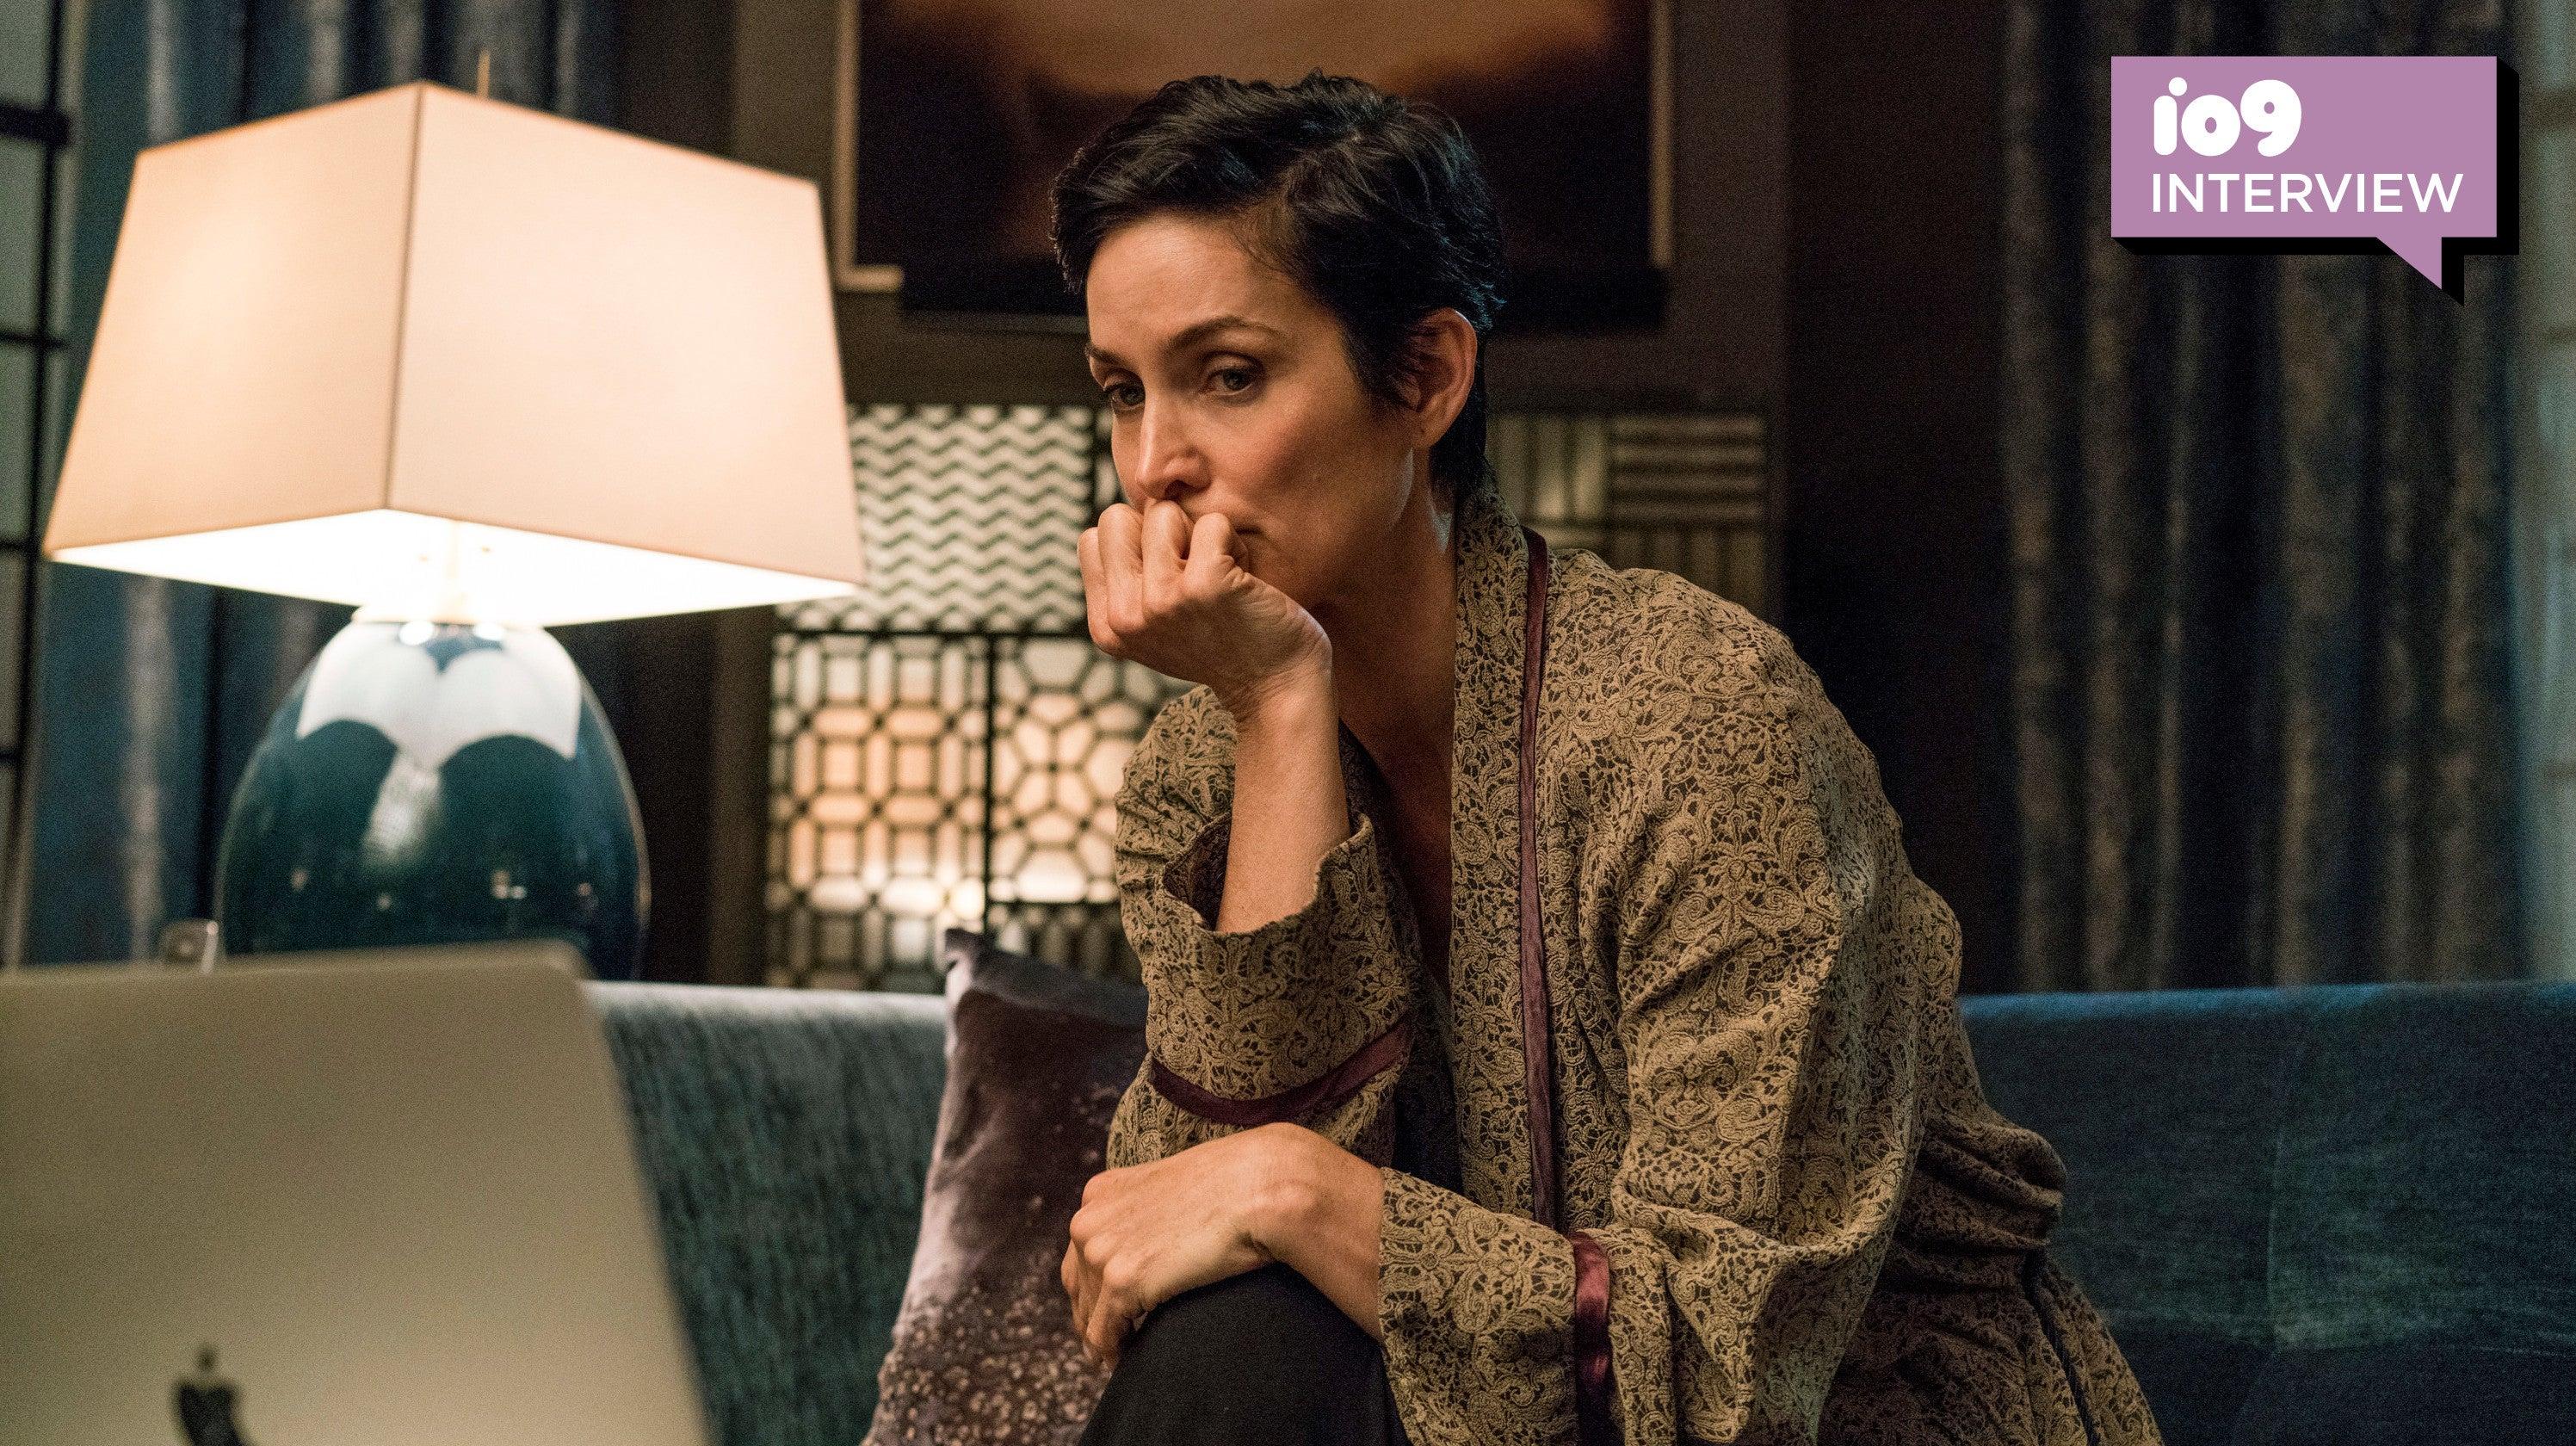 Jessica Jones' Carrie-Anne Moss Discusses The Dangerous, Yet Vulnerable, Jeri Hogarth